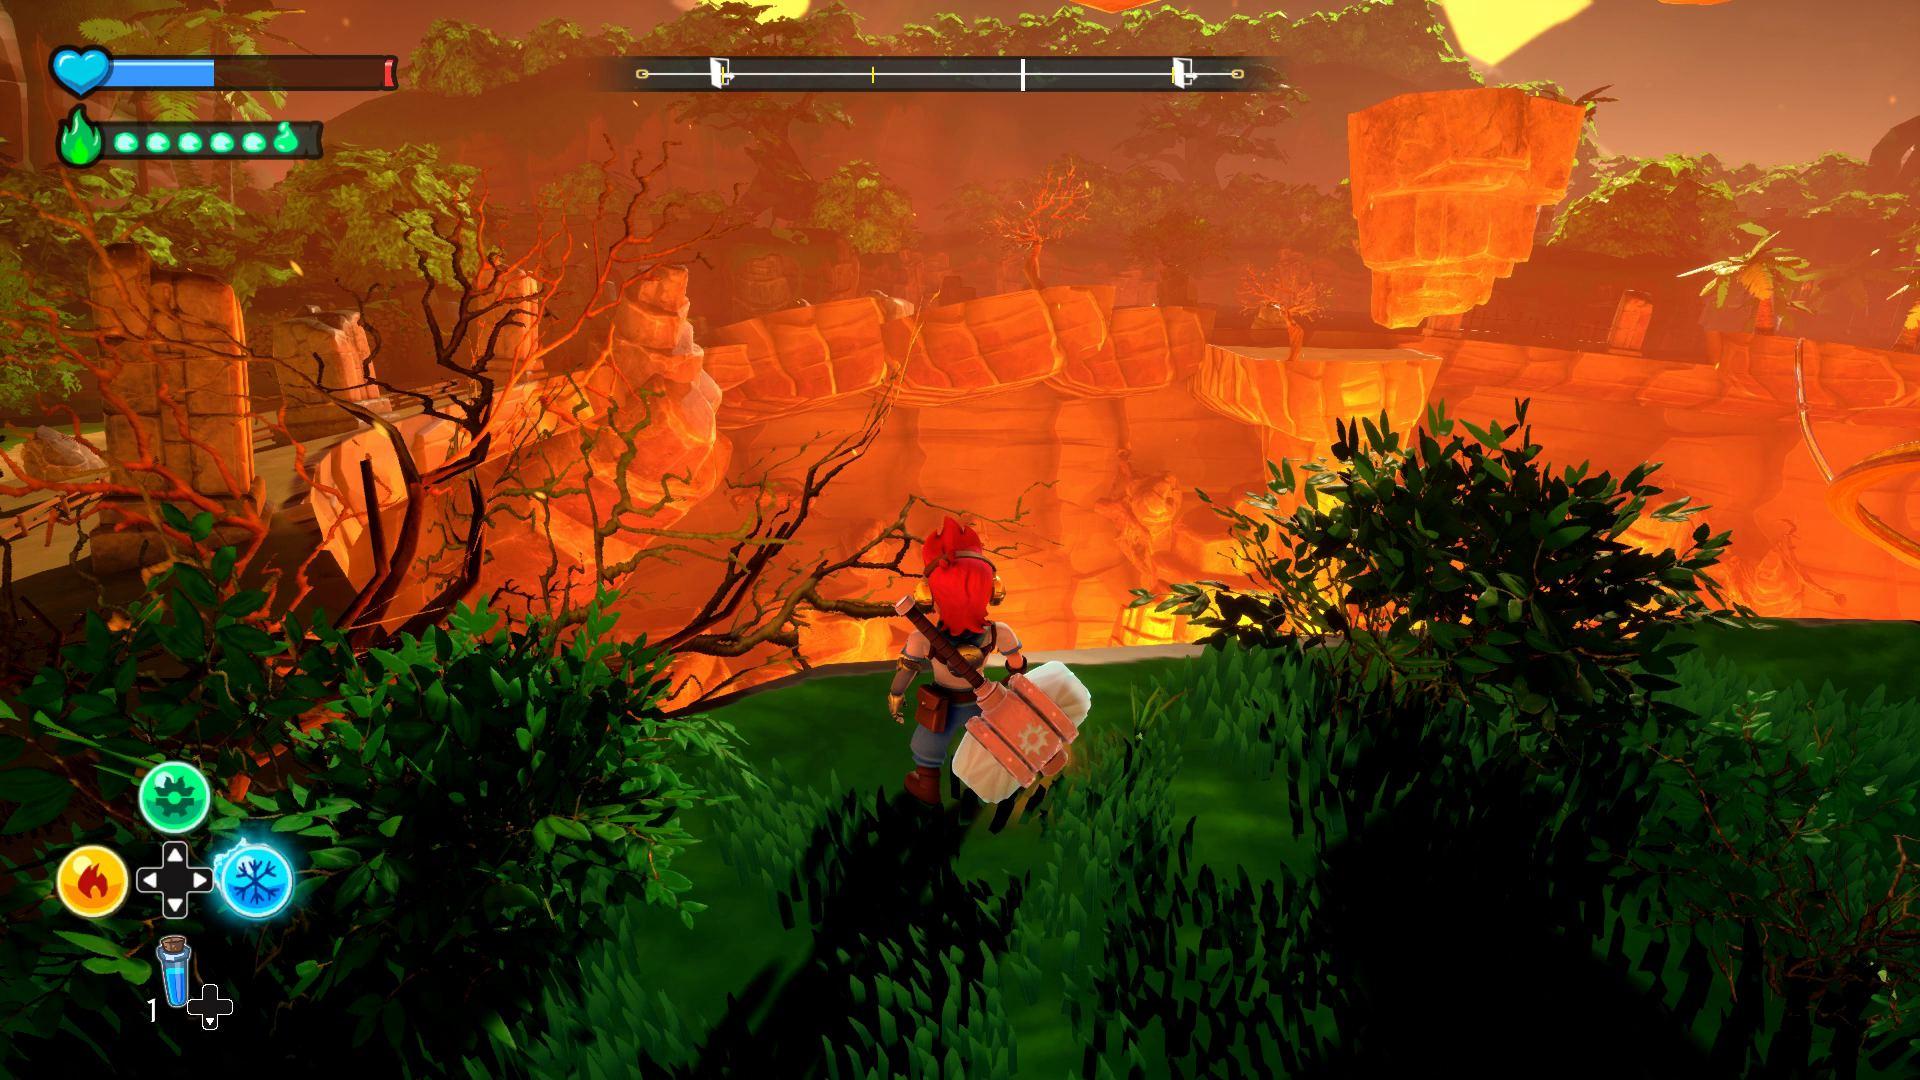 A_Knights_Quest_Screenshot_8